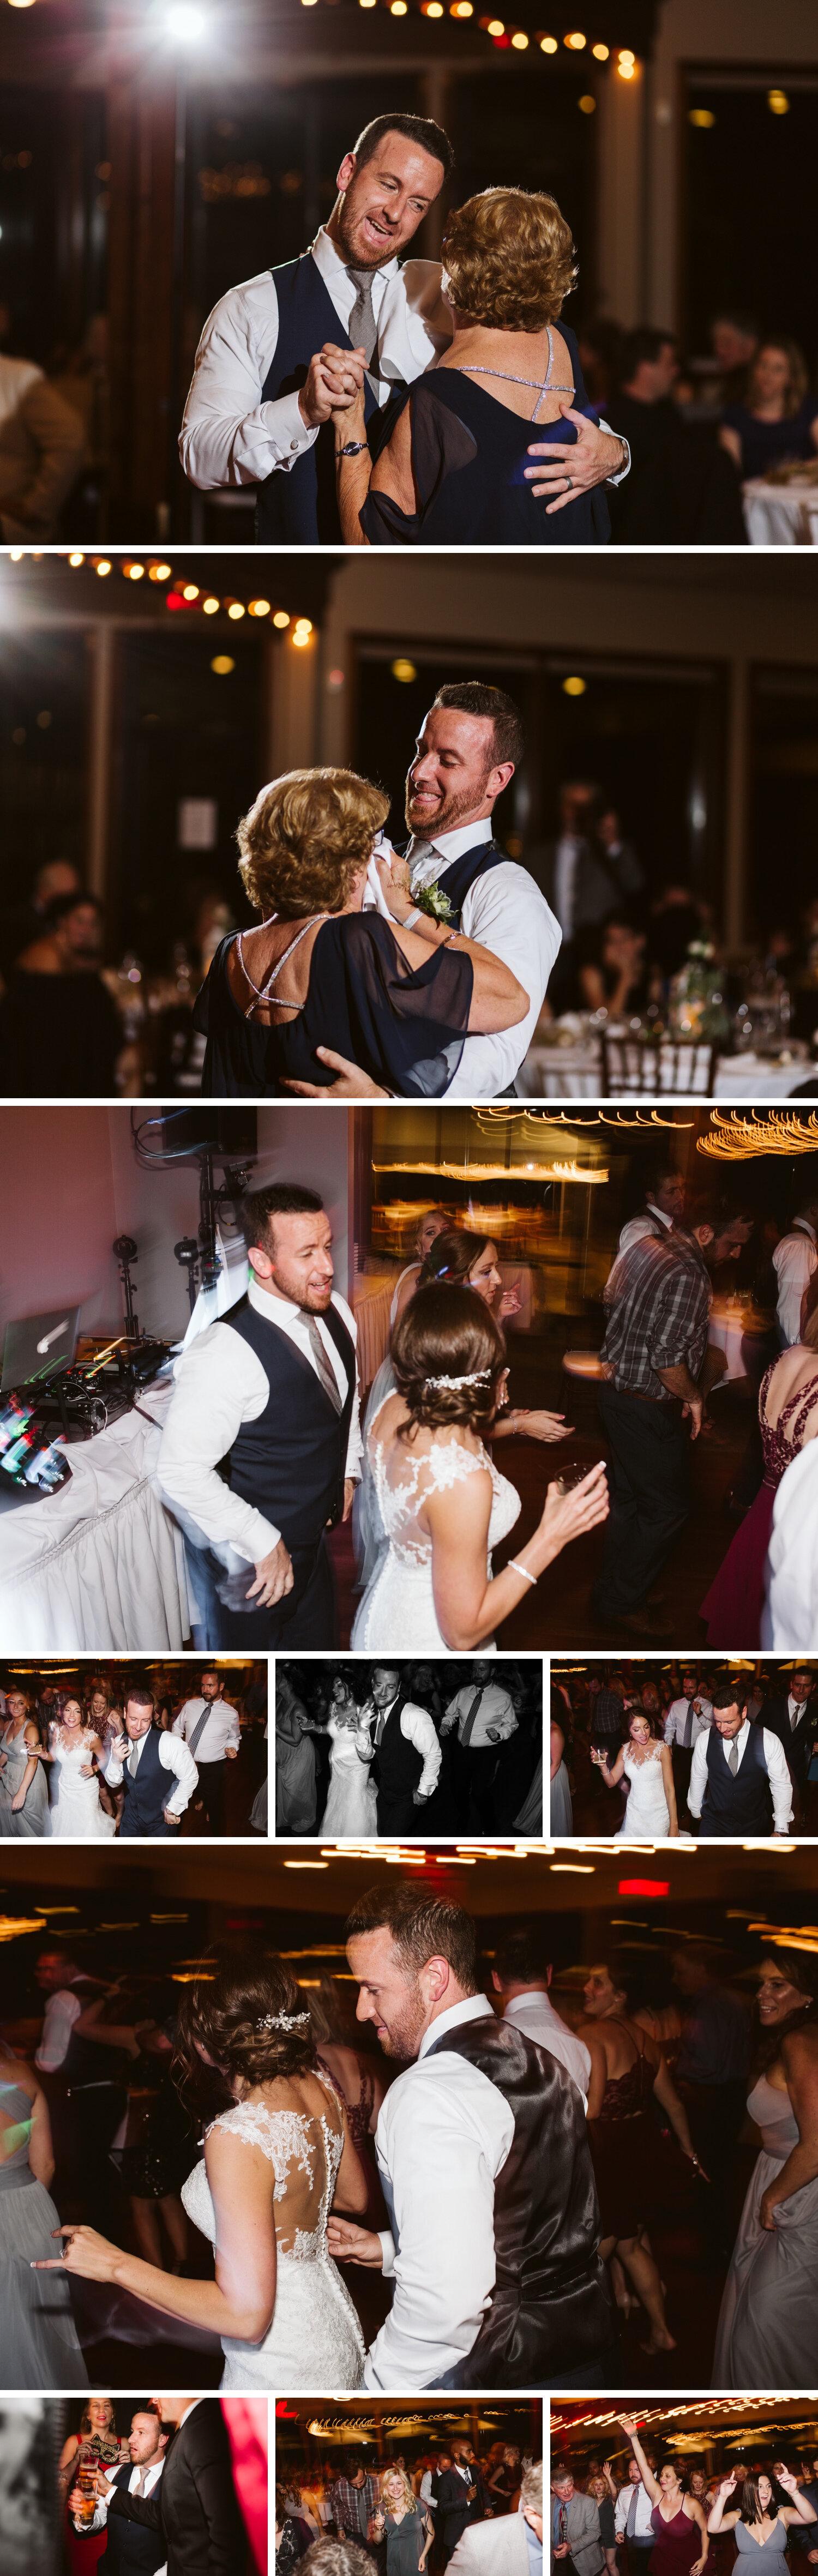 Michigan wedding photographer